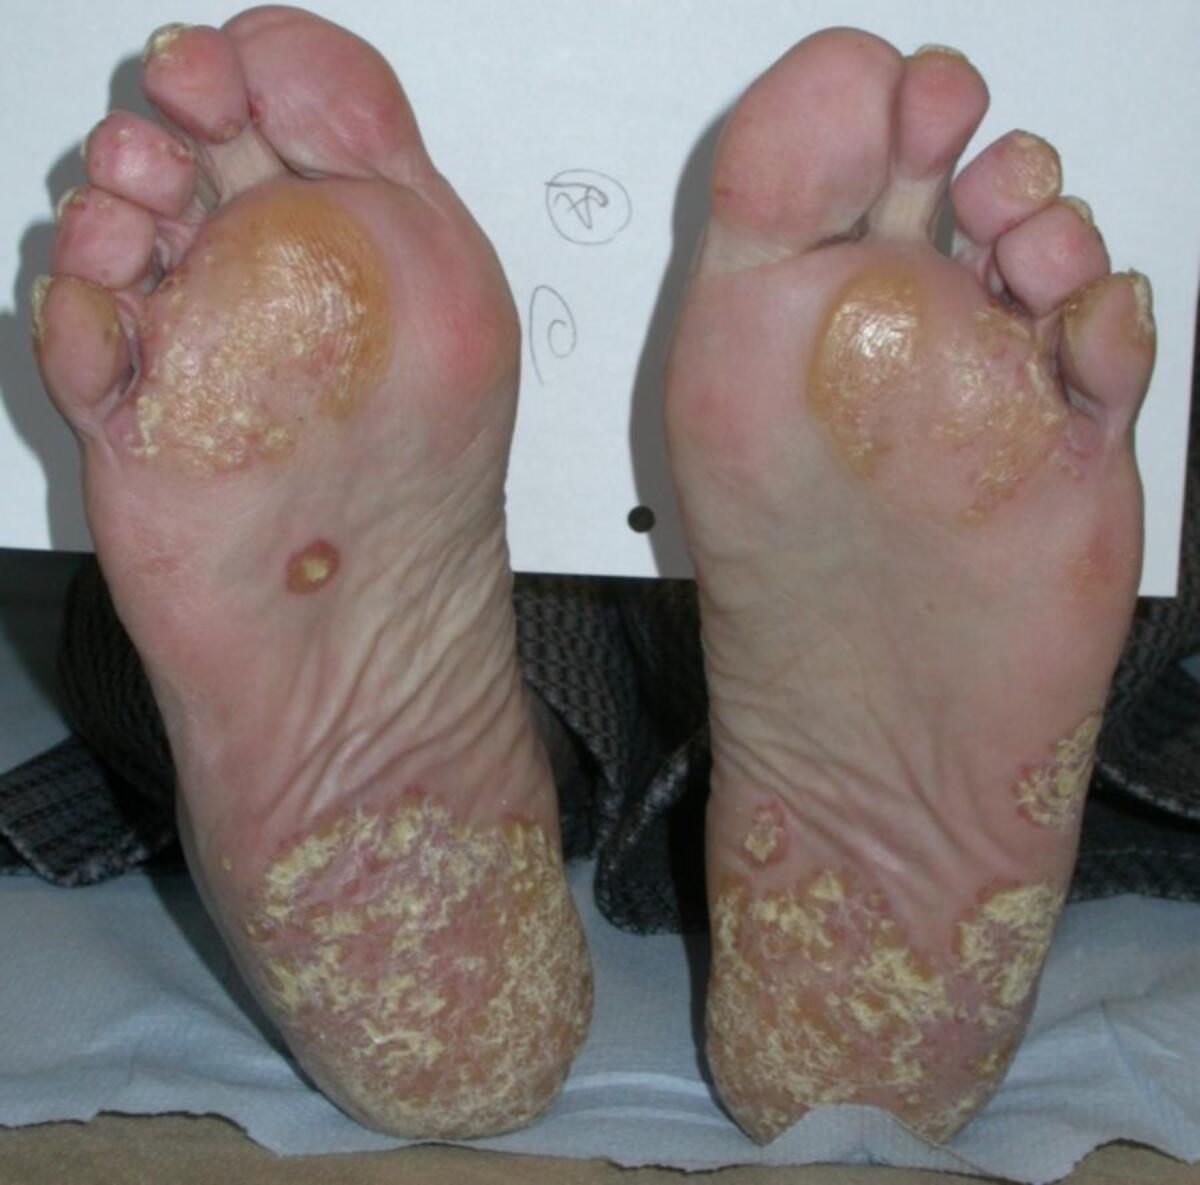 psoriasis on feet and hands pikkelysömör kezelése lazarral